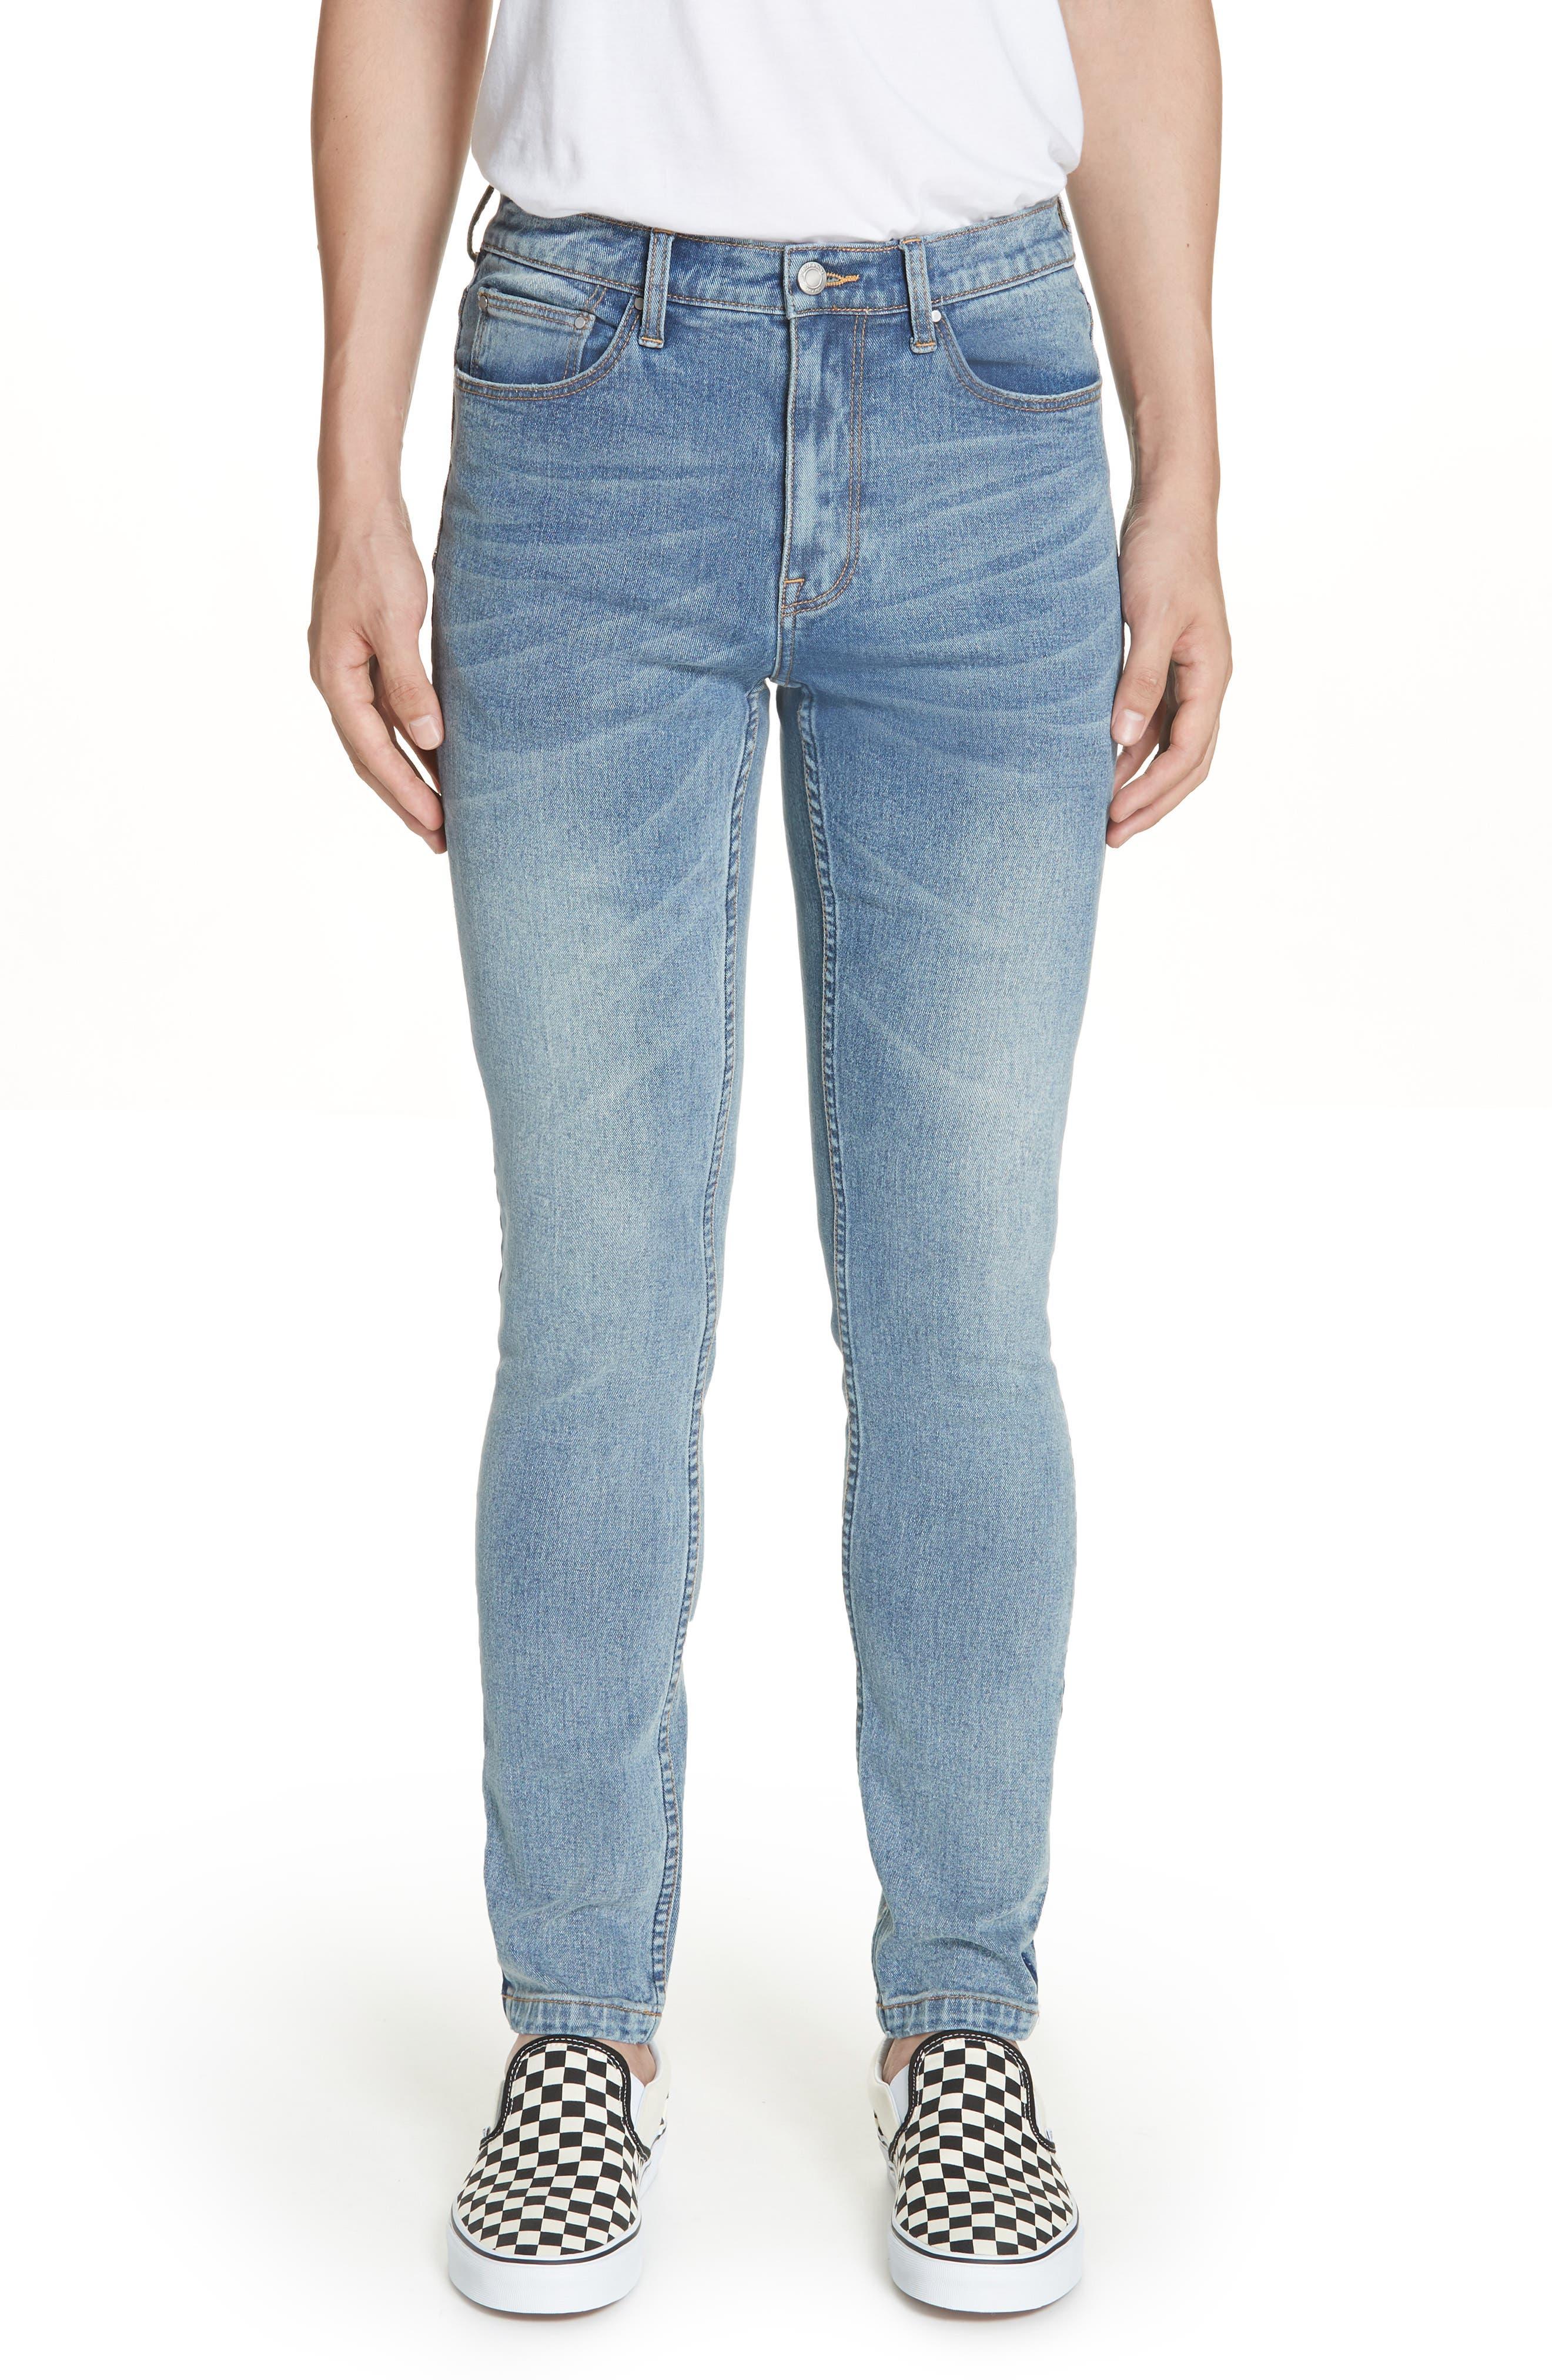 OVADIA & SONS,                             OS-1 Slim Fit Jeans,                             Main thumbnail 1, color,                             INDIGO